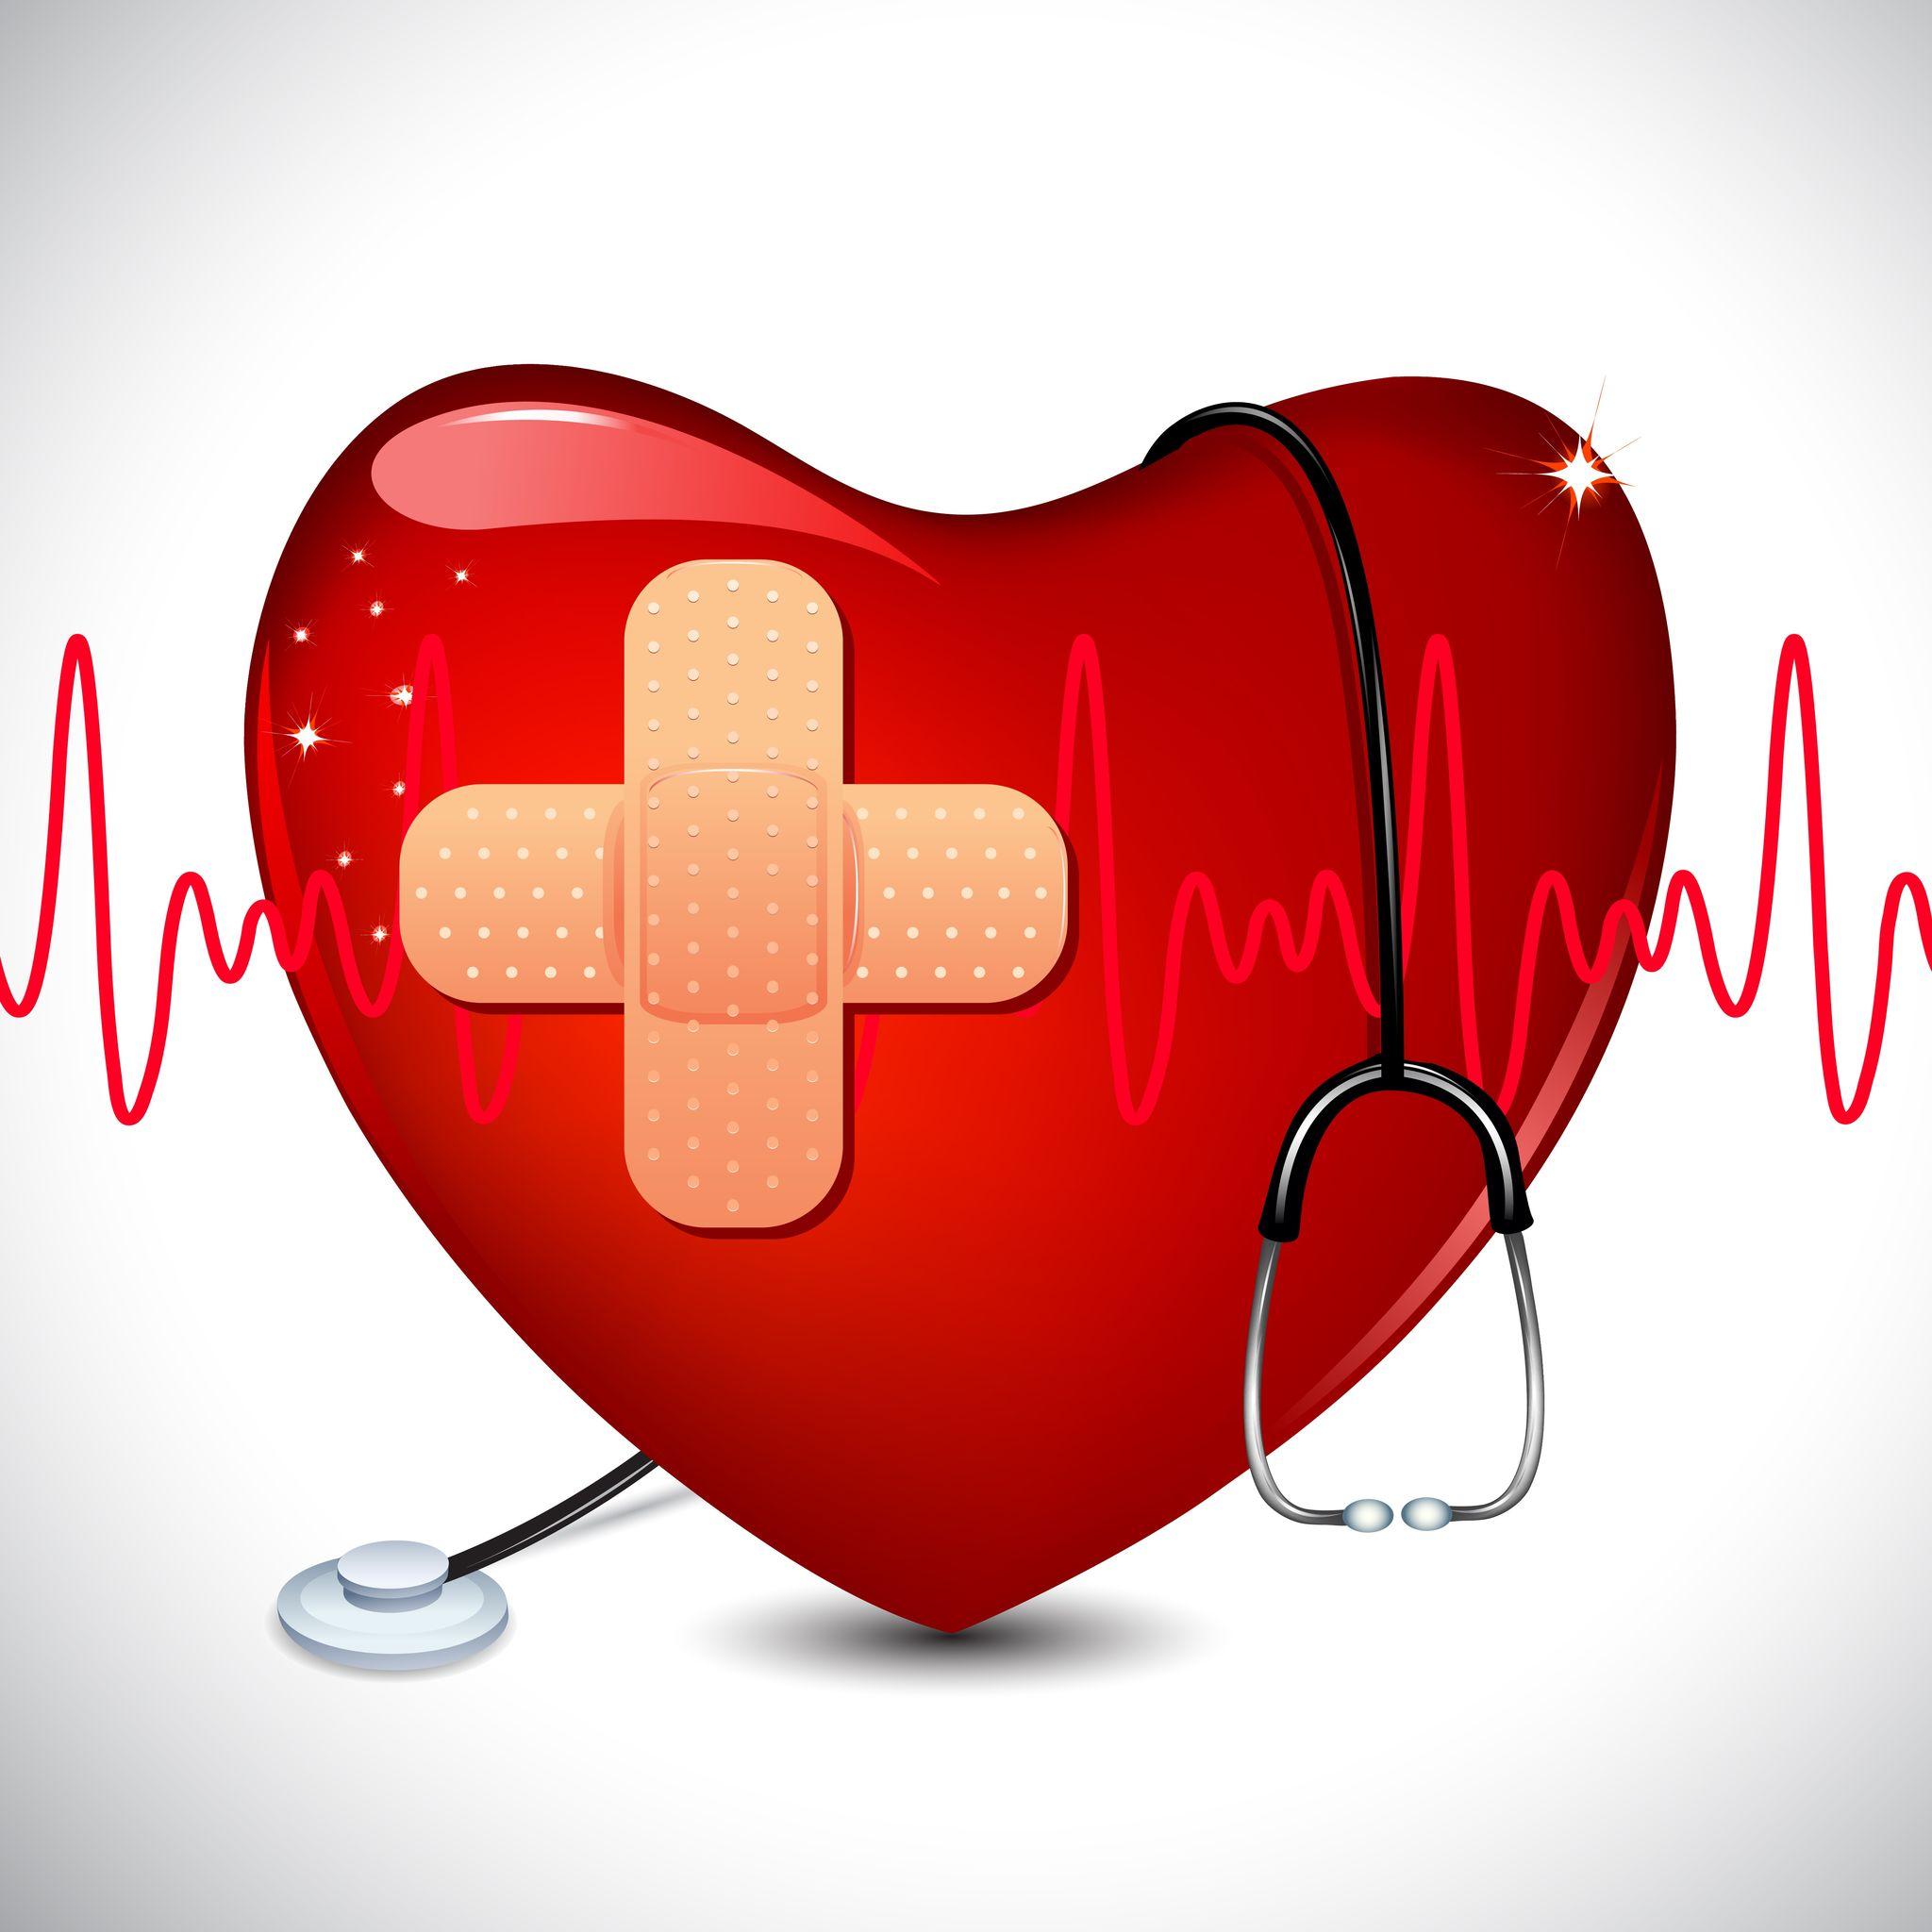 2048x2048 Prevent Heart Disease Healthampfitness Talk